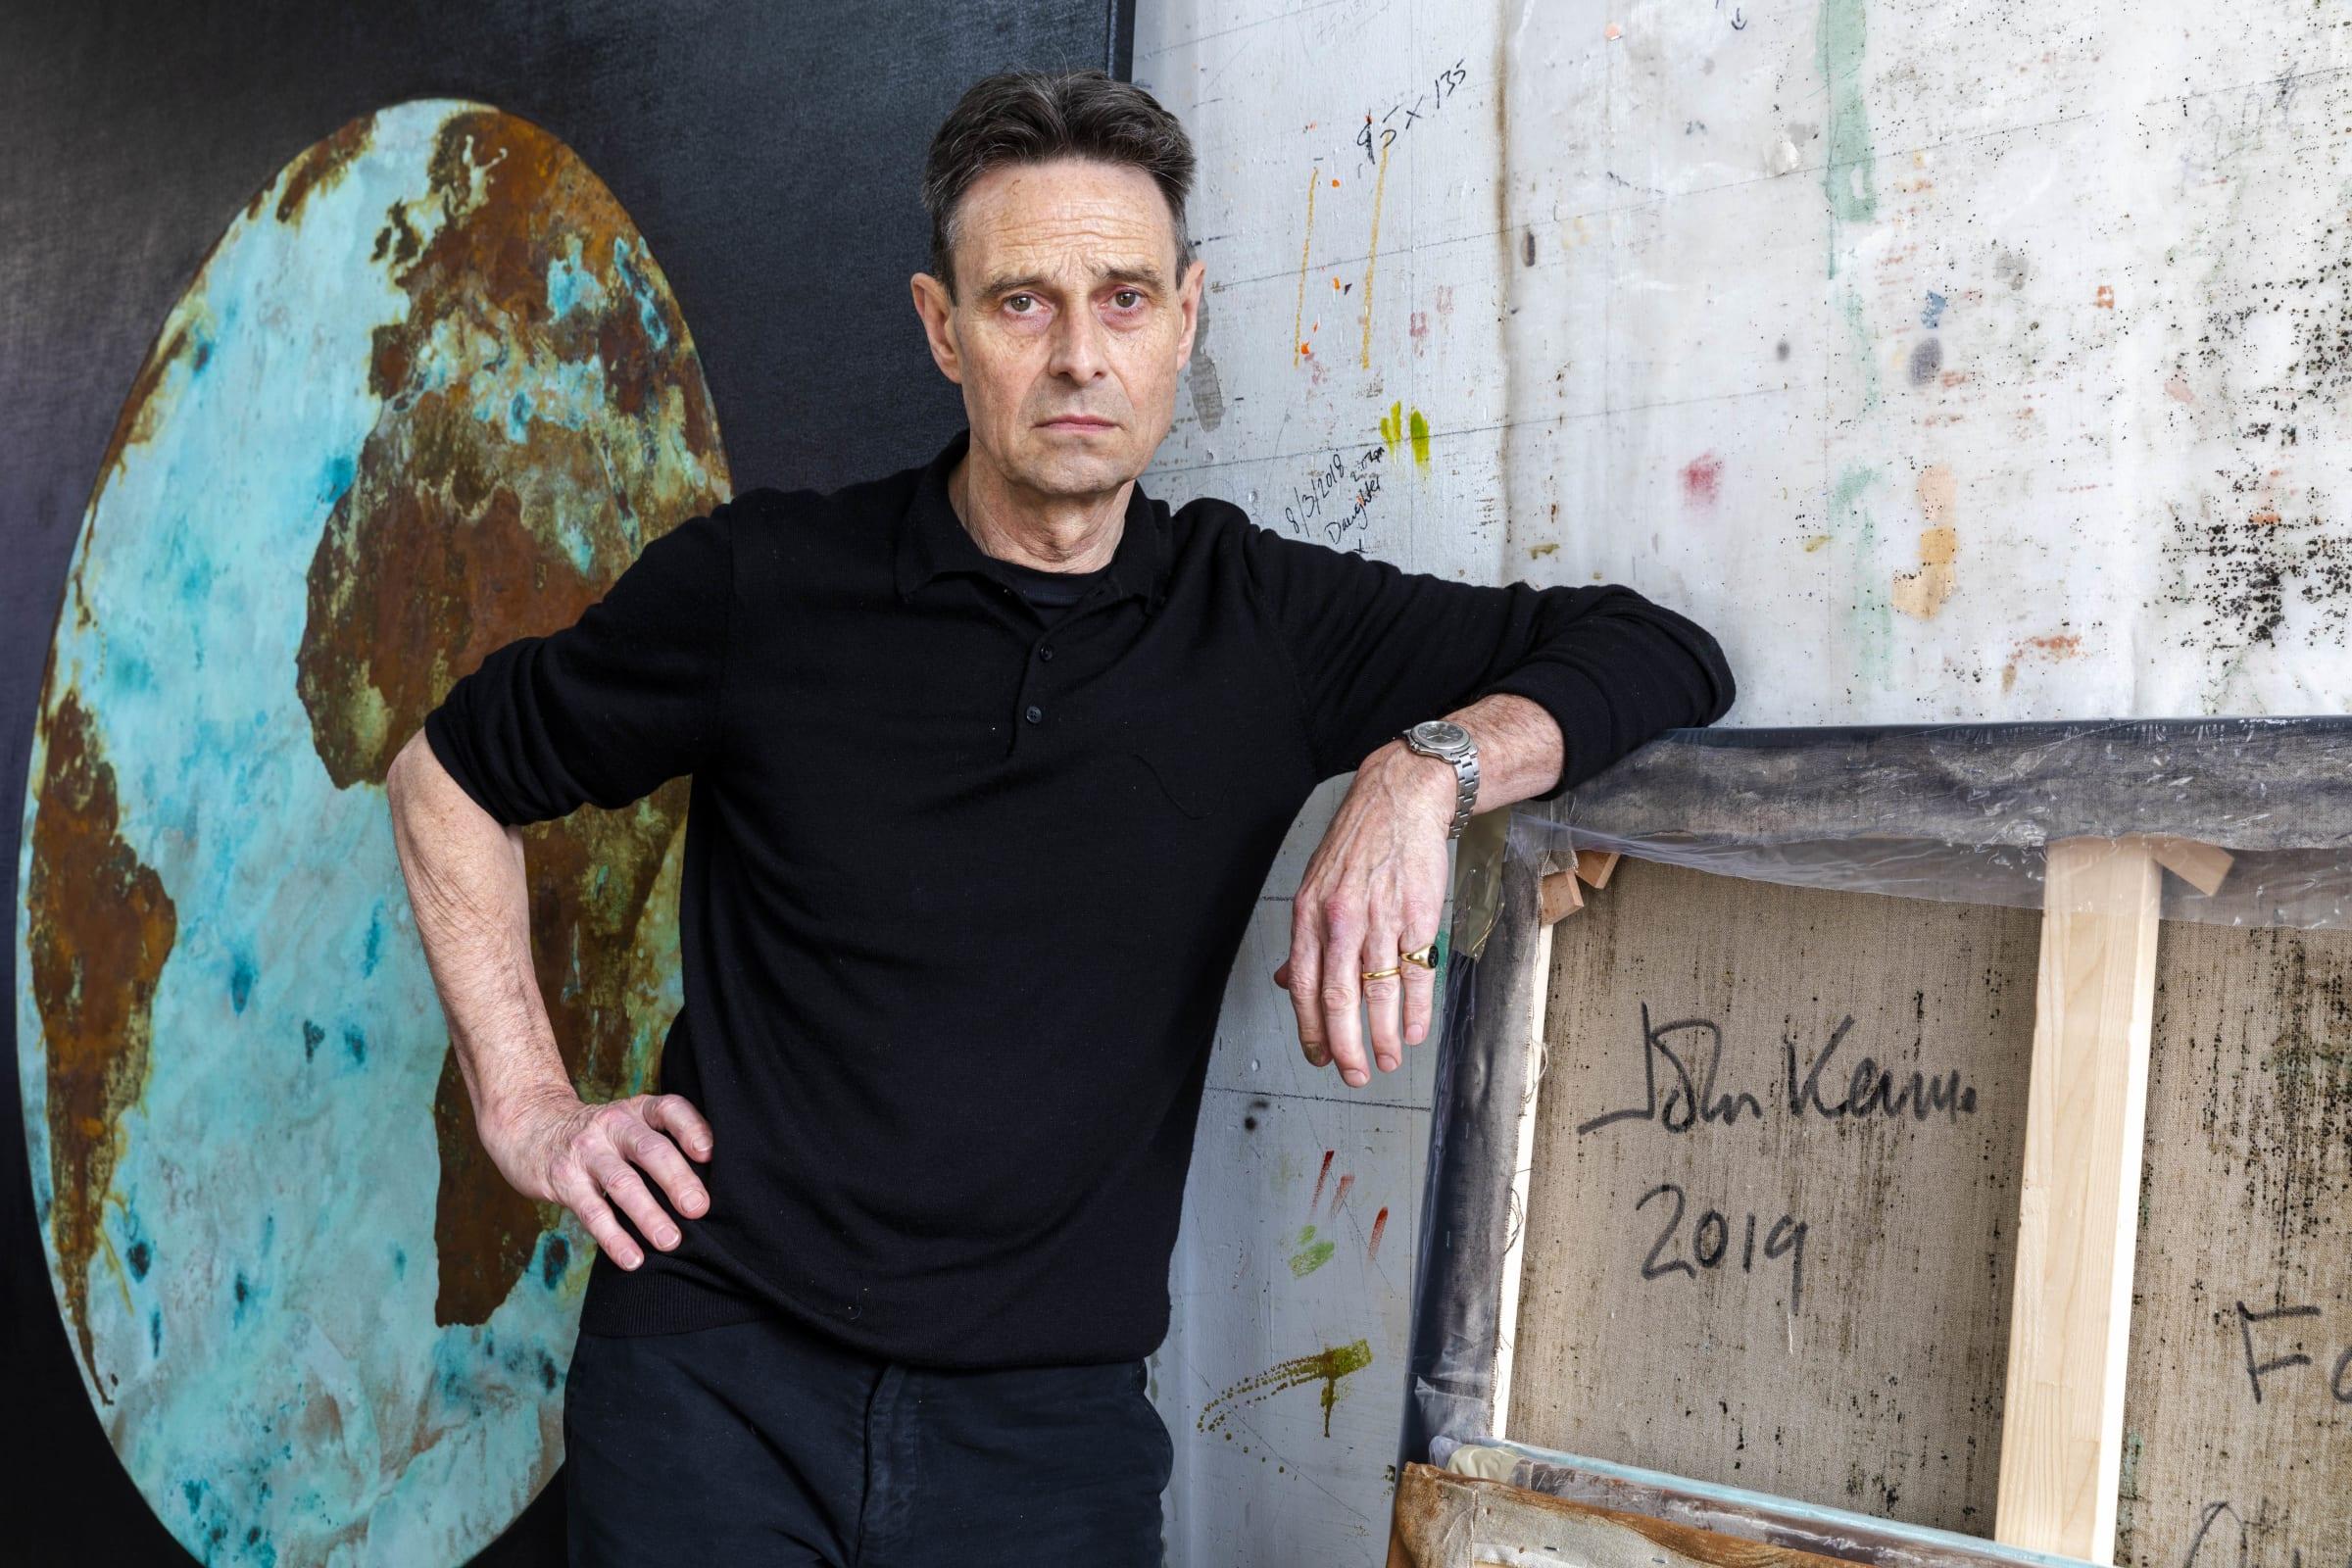 John Keane Flat Earth : In the Studio